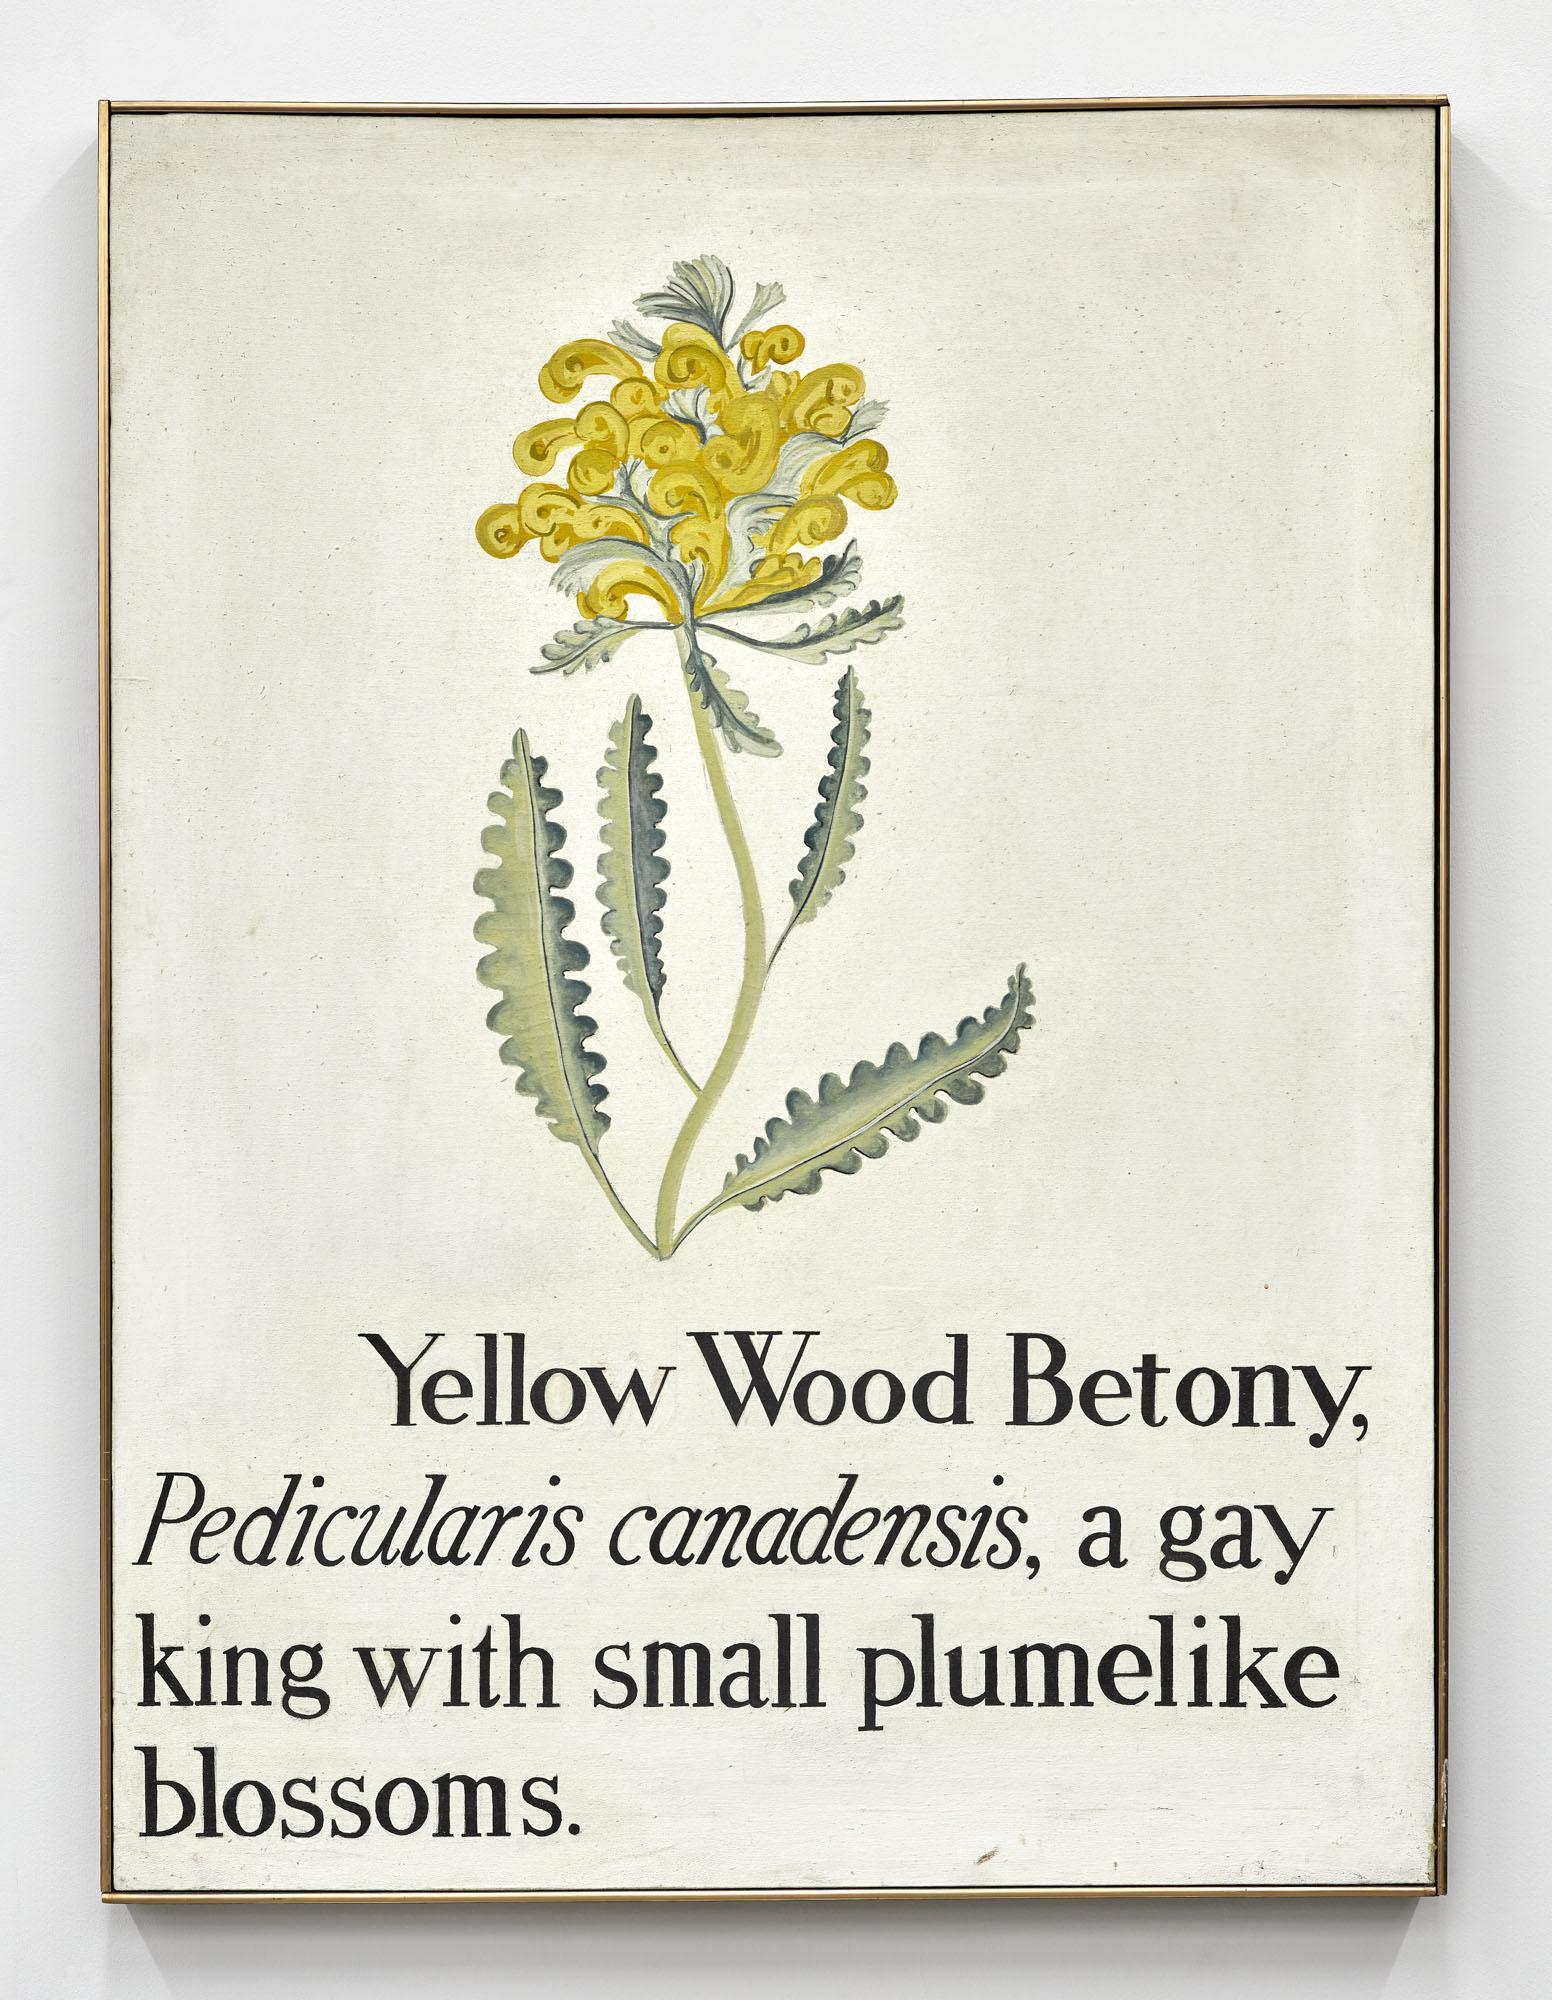 Vern Blosum,/Betony/, 1962, oil on canvas, 101.6 × 76.2 cm